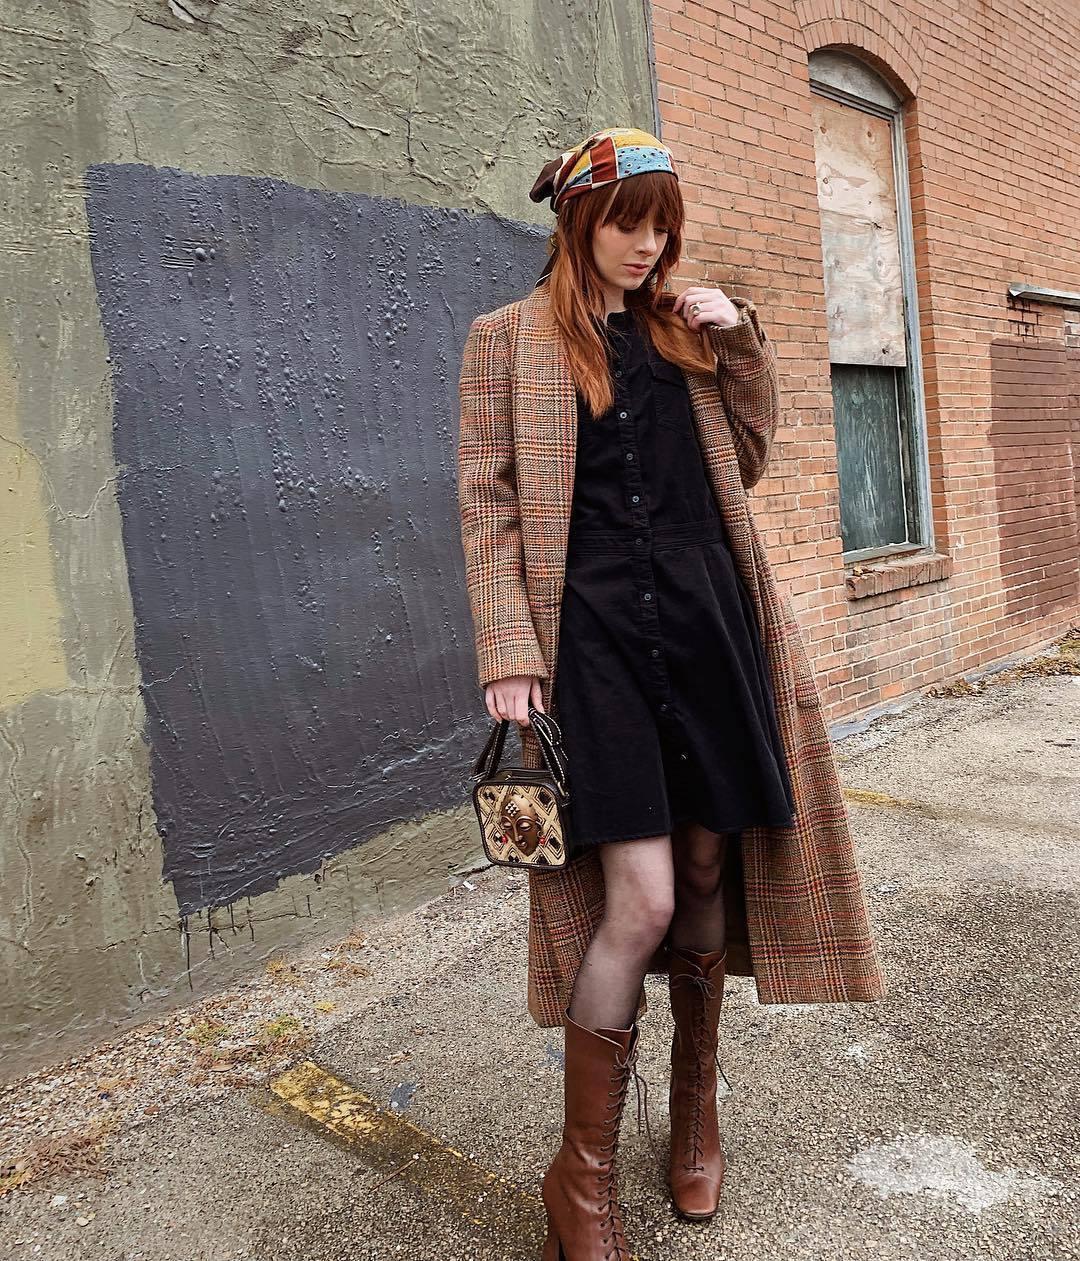 dress black dress brown boots lace up boots plaid long coat handbag